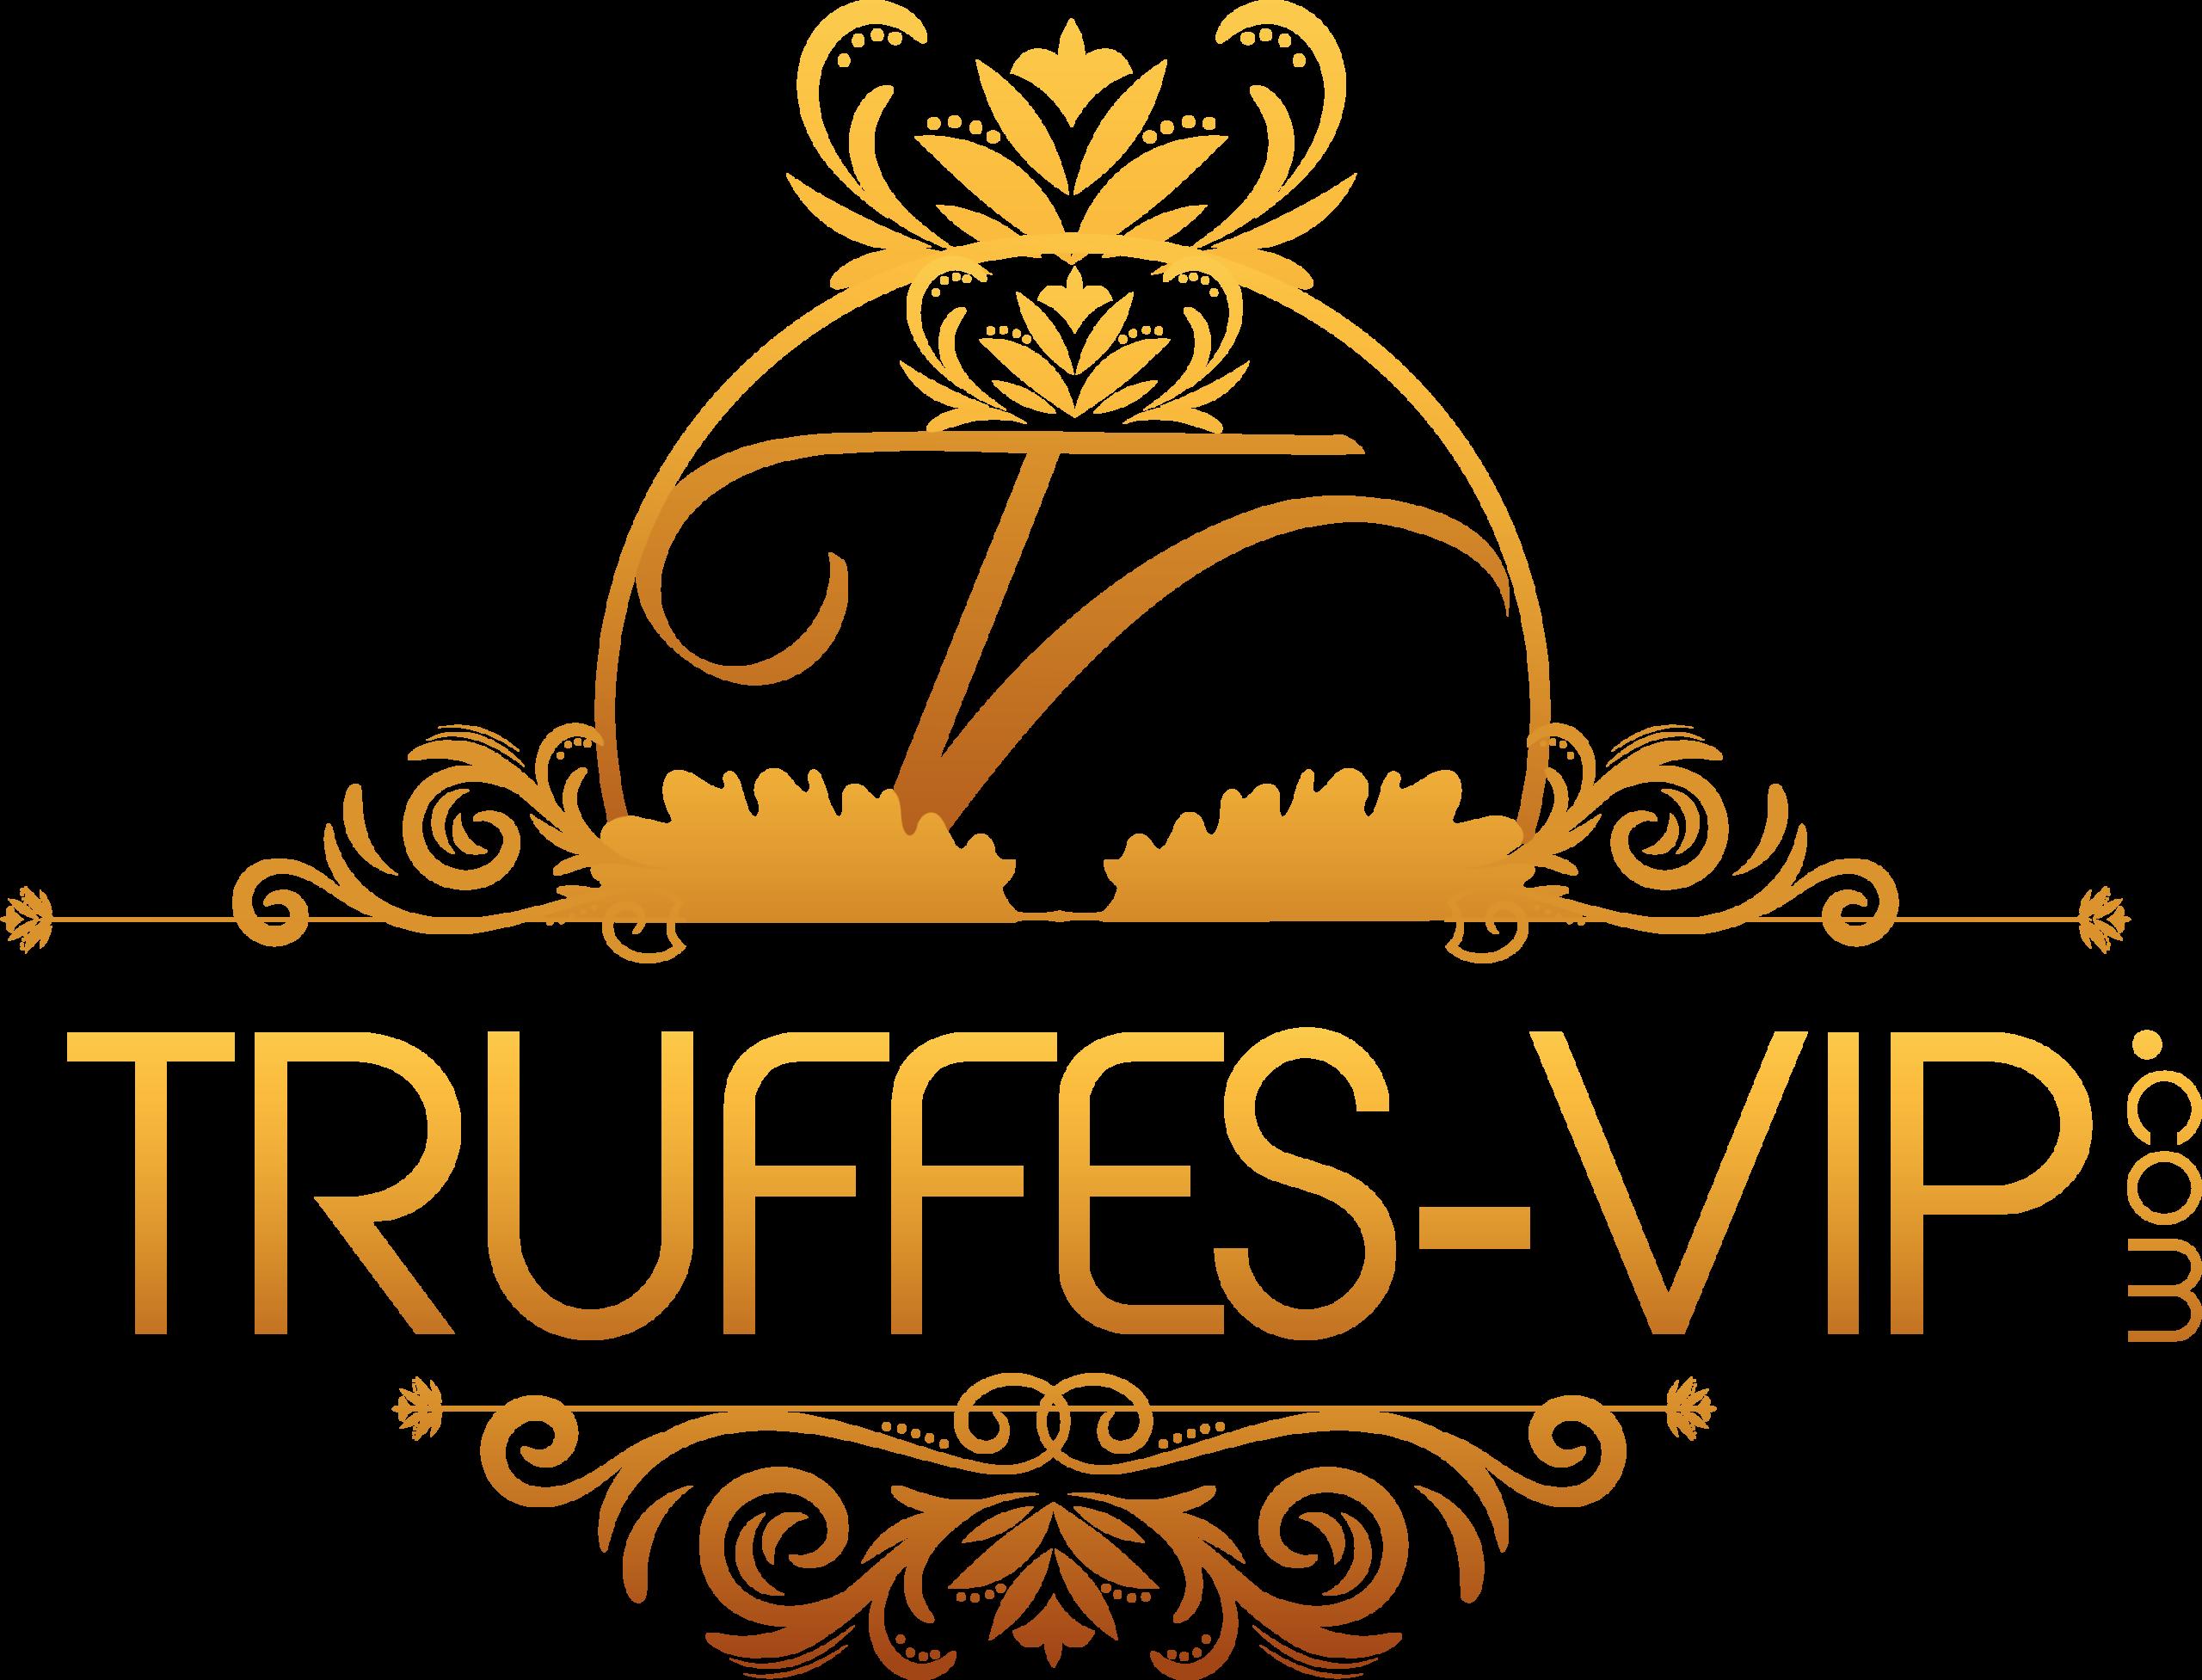 Strufail VIP